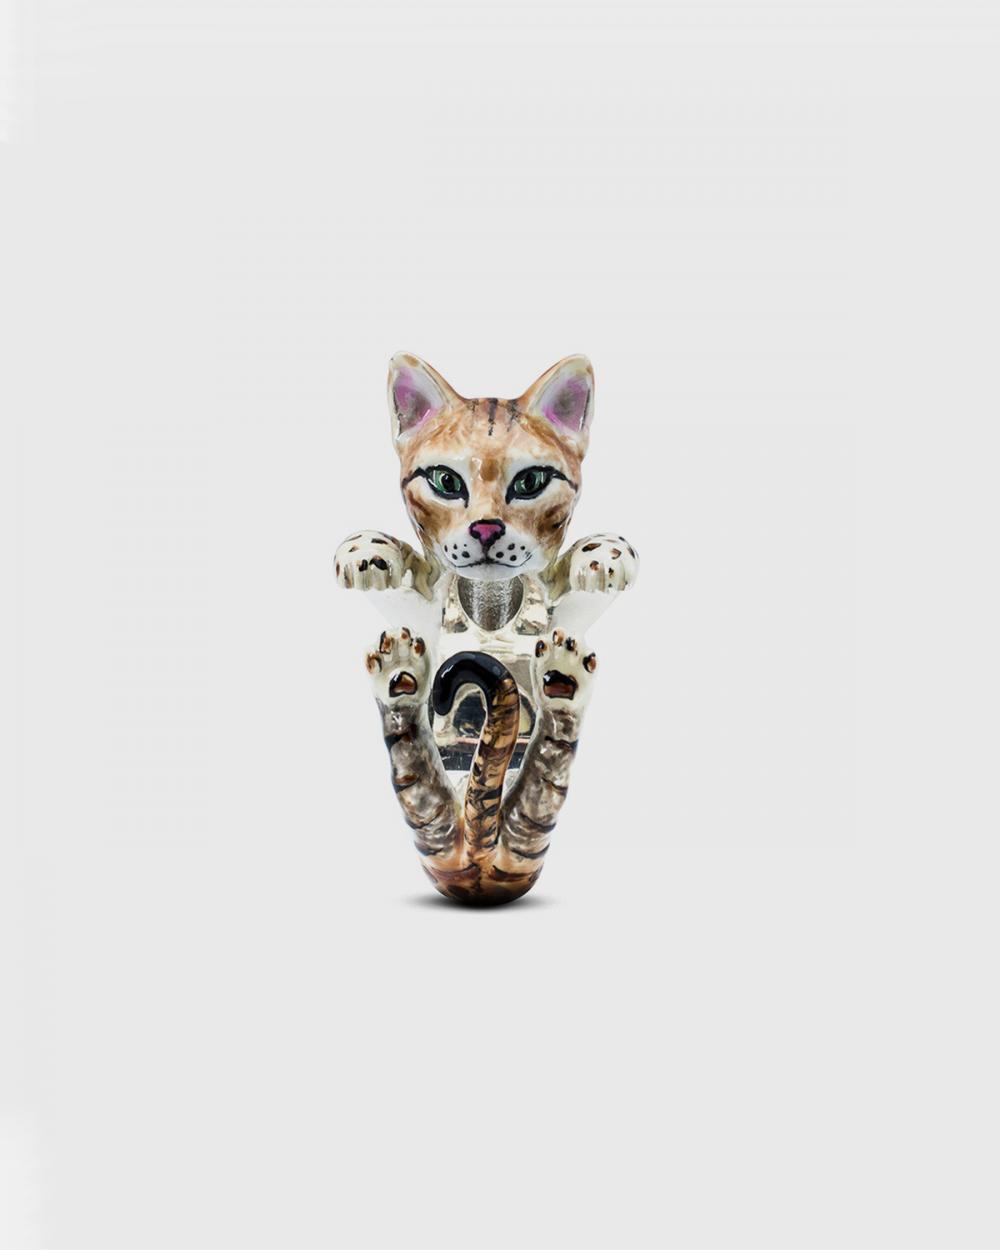 Cat Fever BENGAL HUG RING / ENAMELLED NOVE25